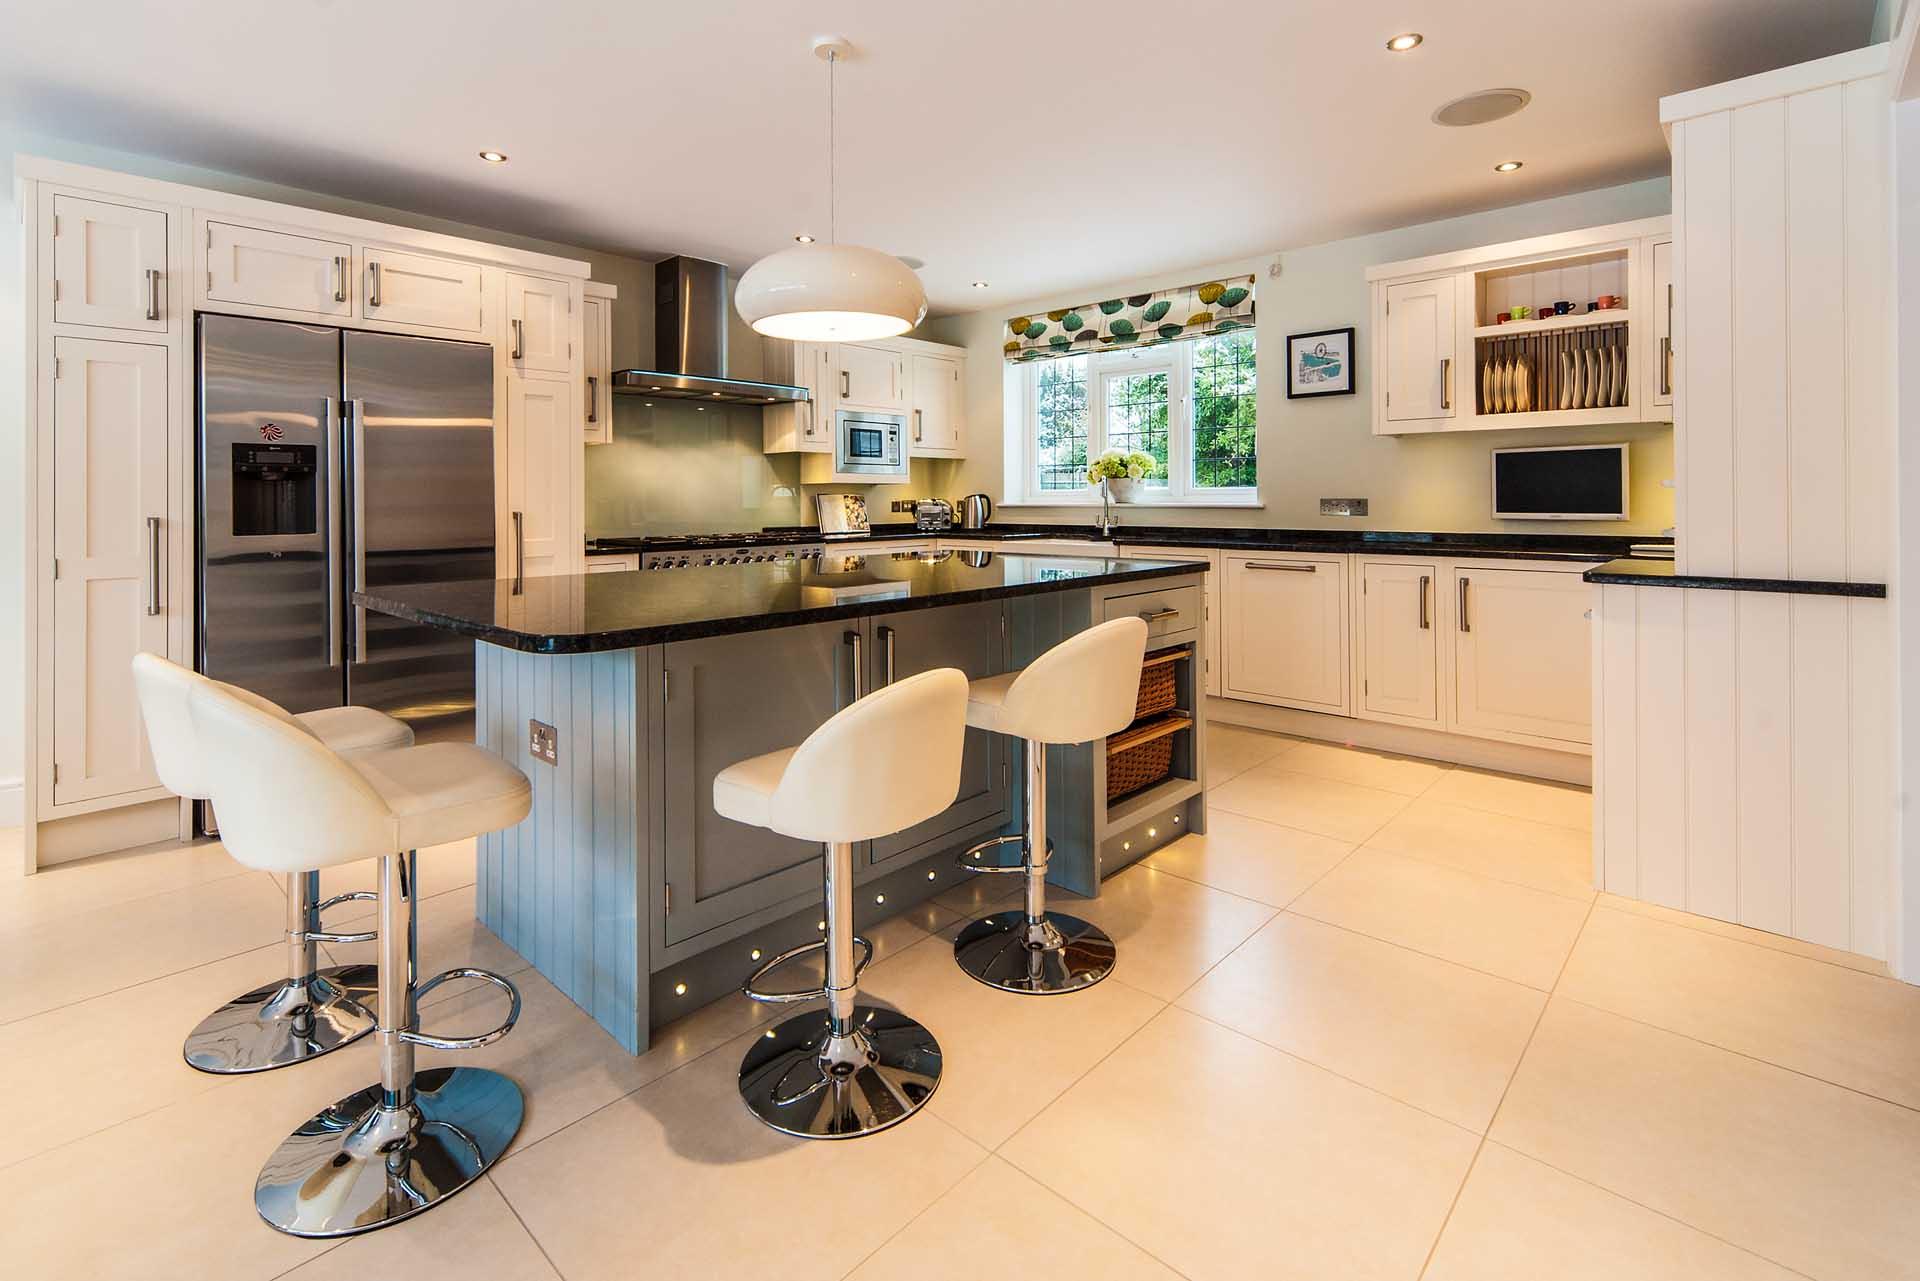 glass-splashbacks-surrey-steel-grey-granite-worktops-offer-110424